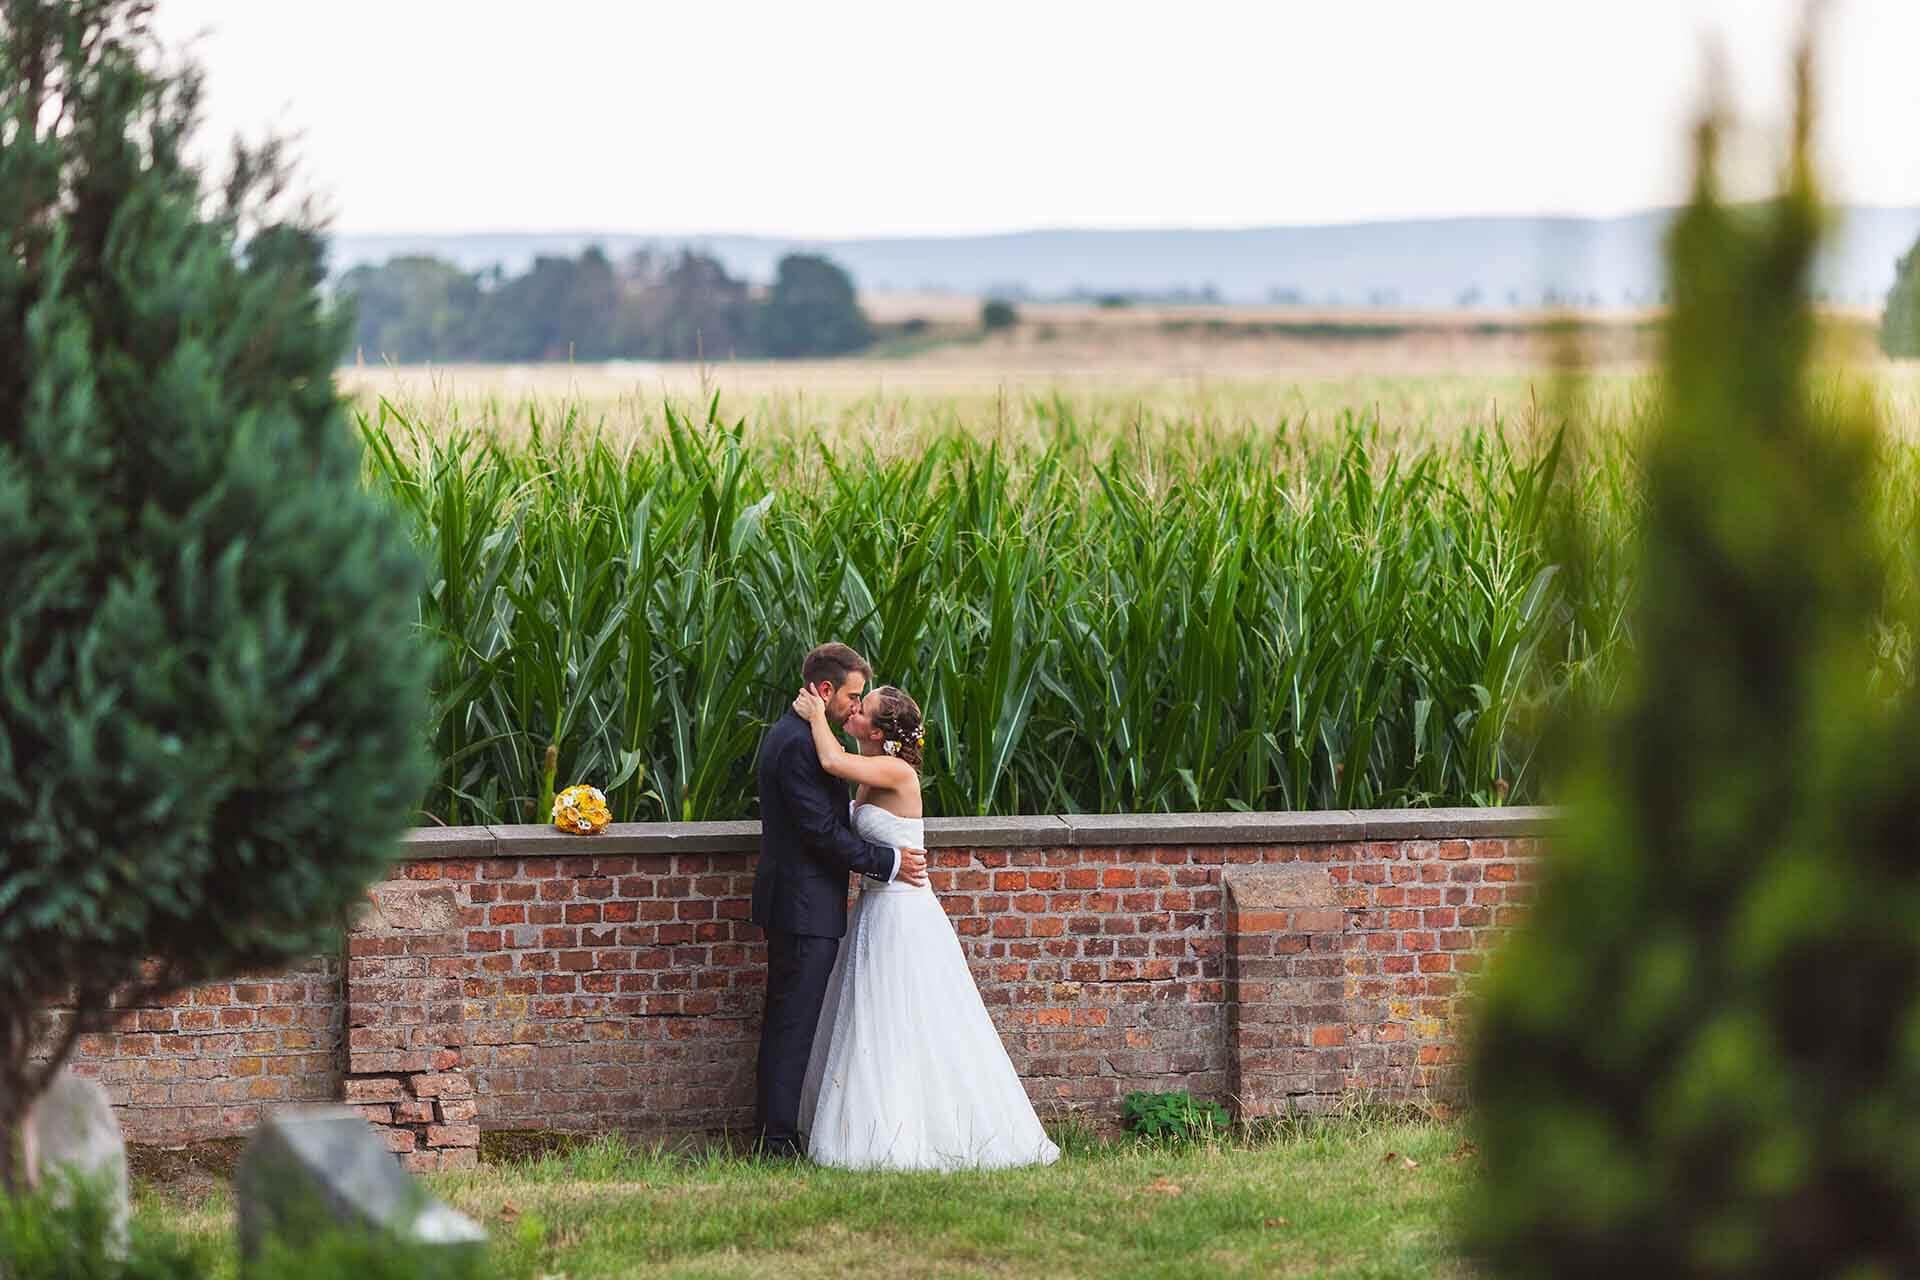 Brautpaarshooting Hochzeitsfotograf Hannover Seelze